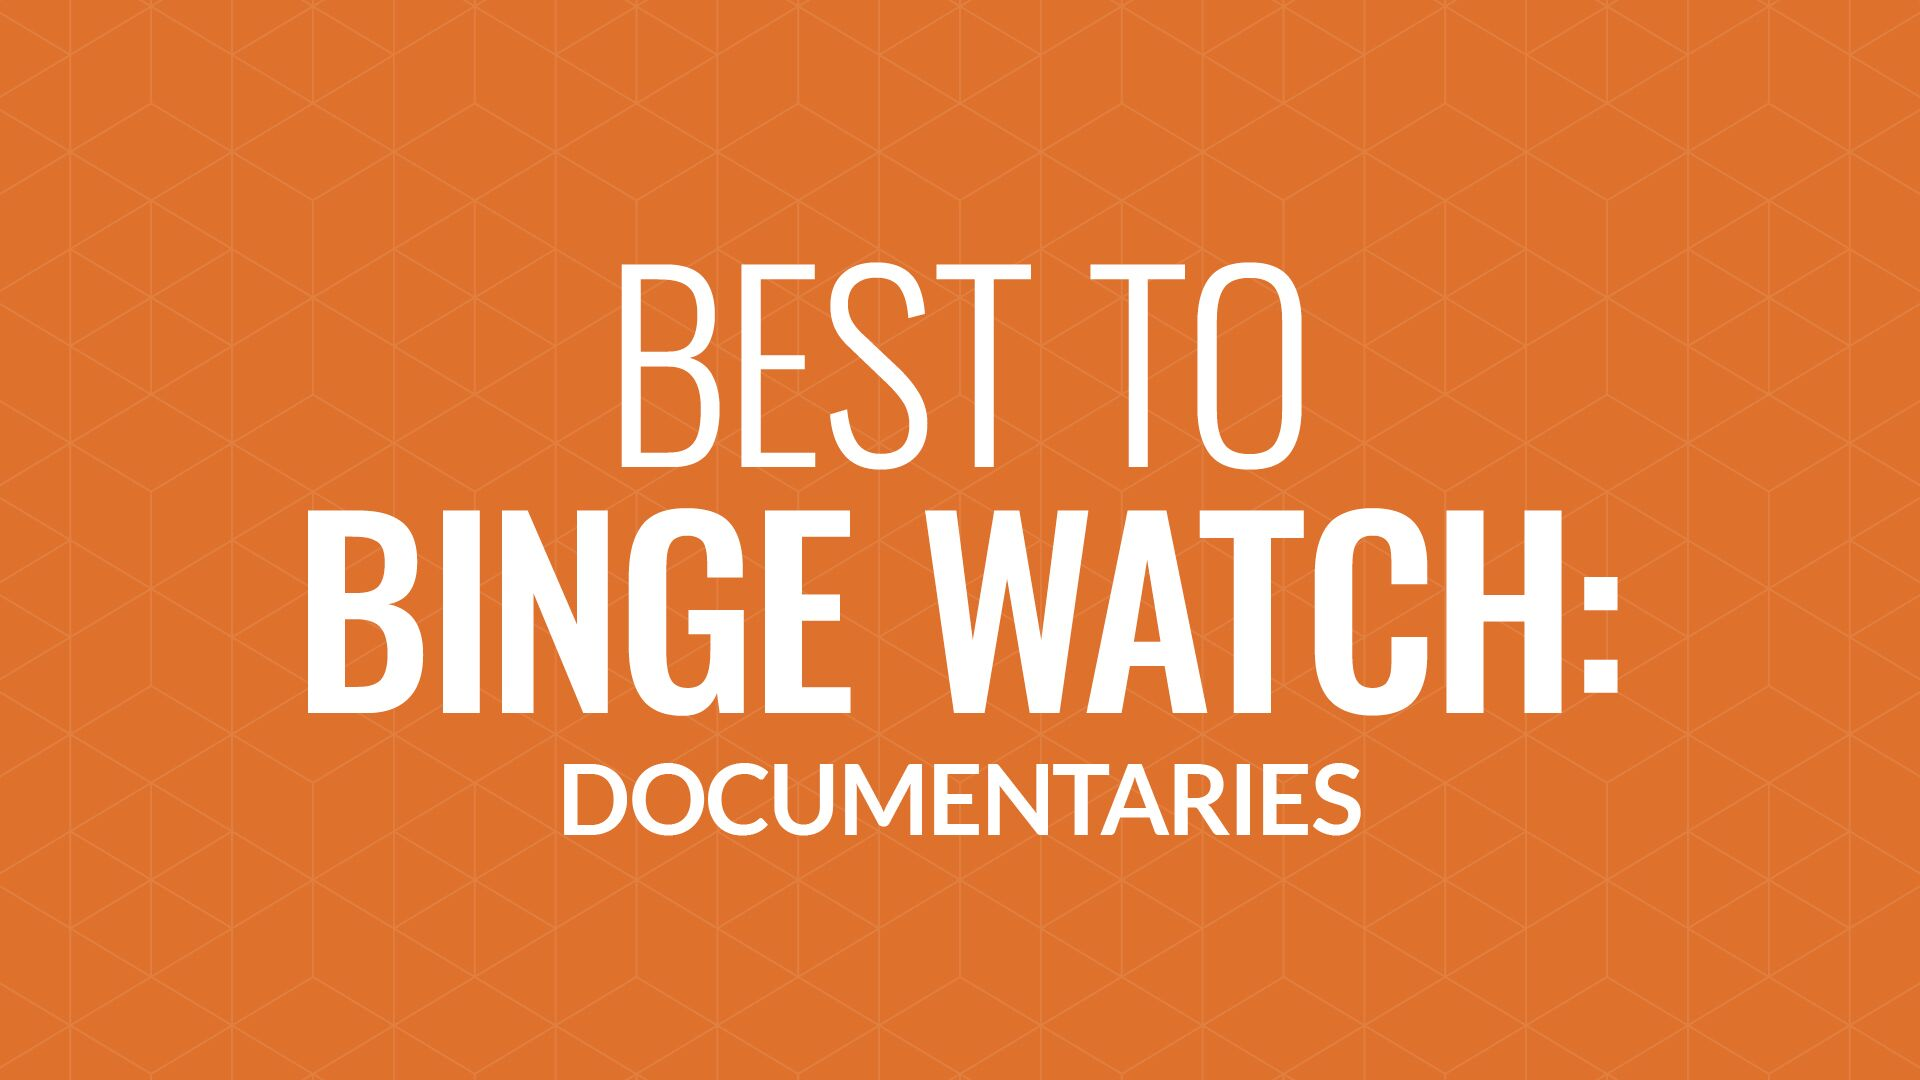 Binge-Worthy Documentaries Hero Image